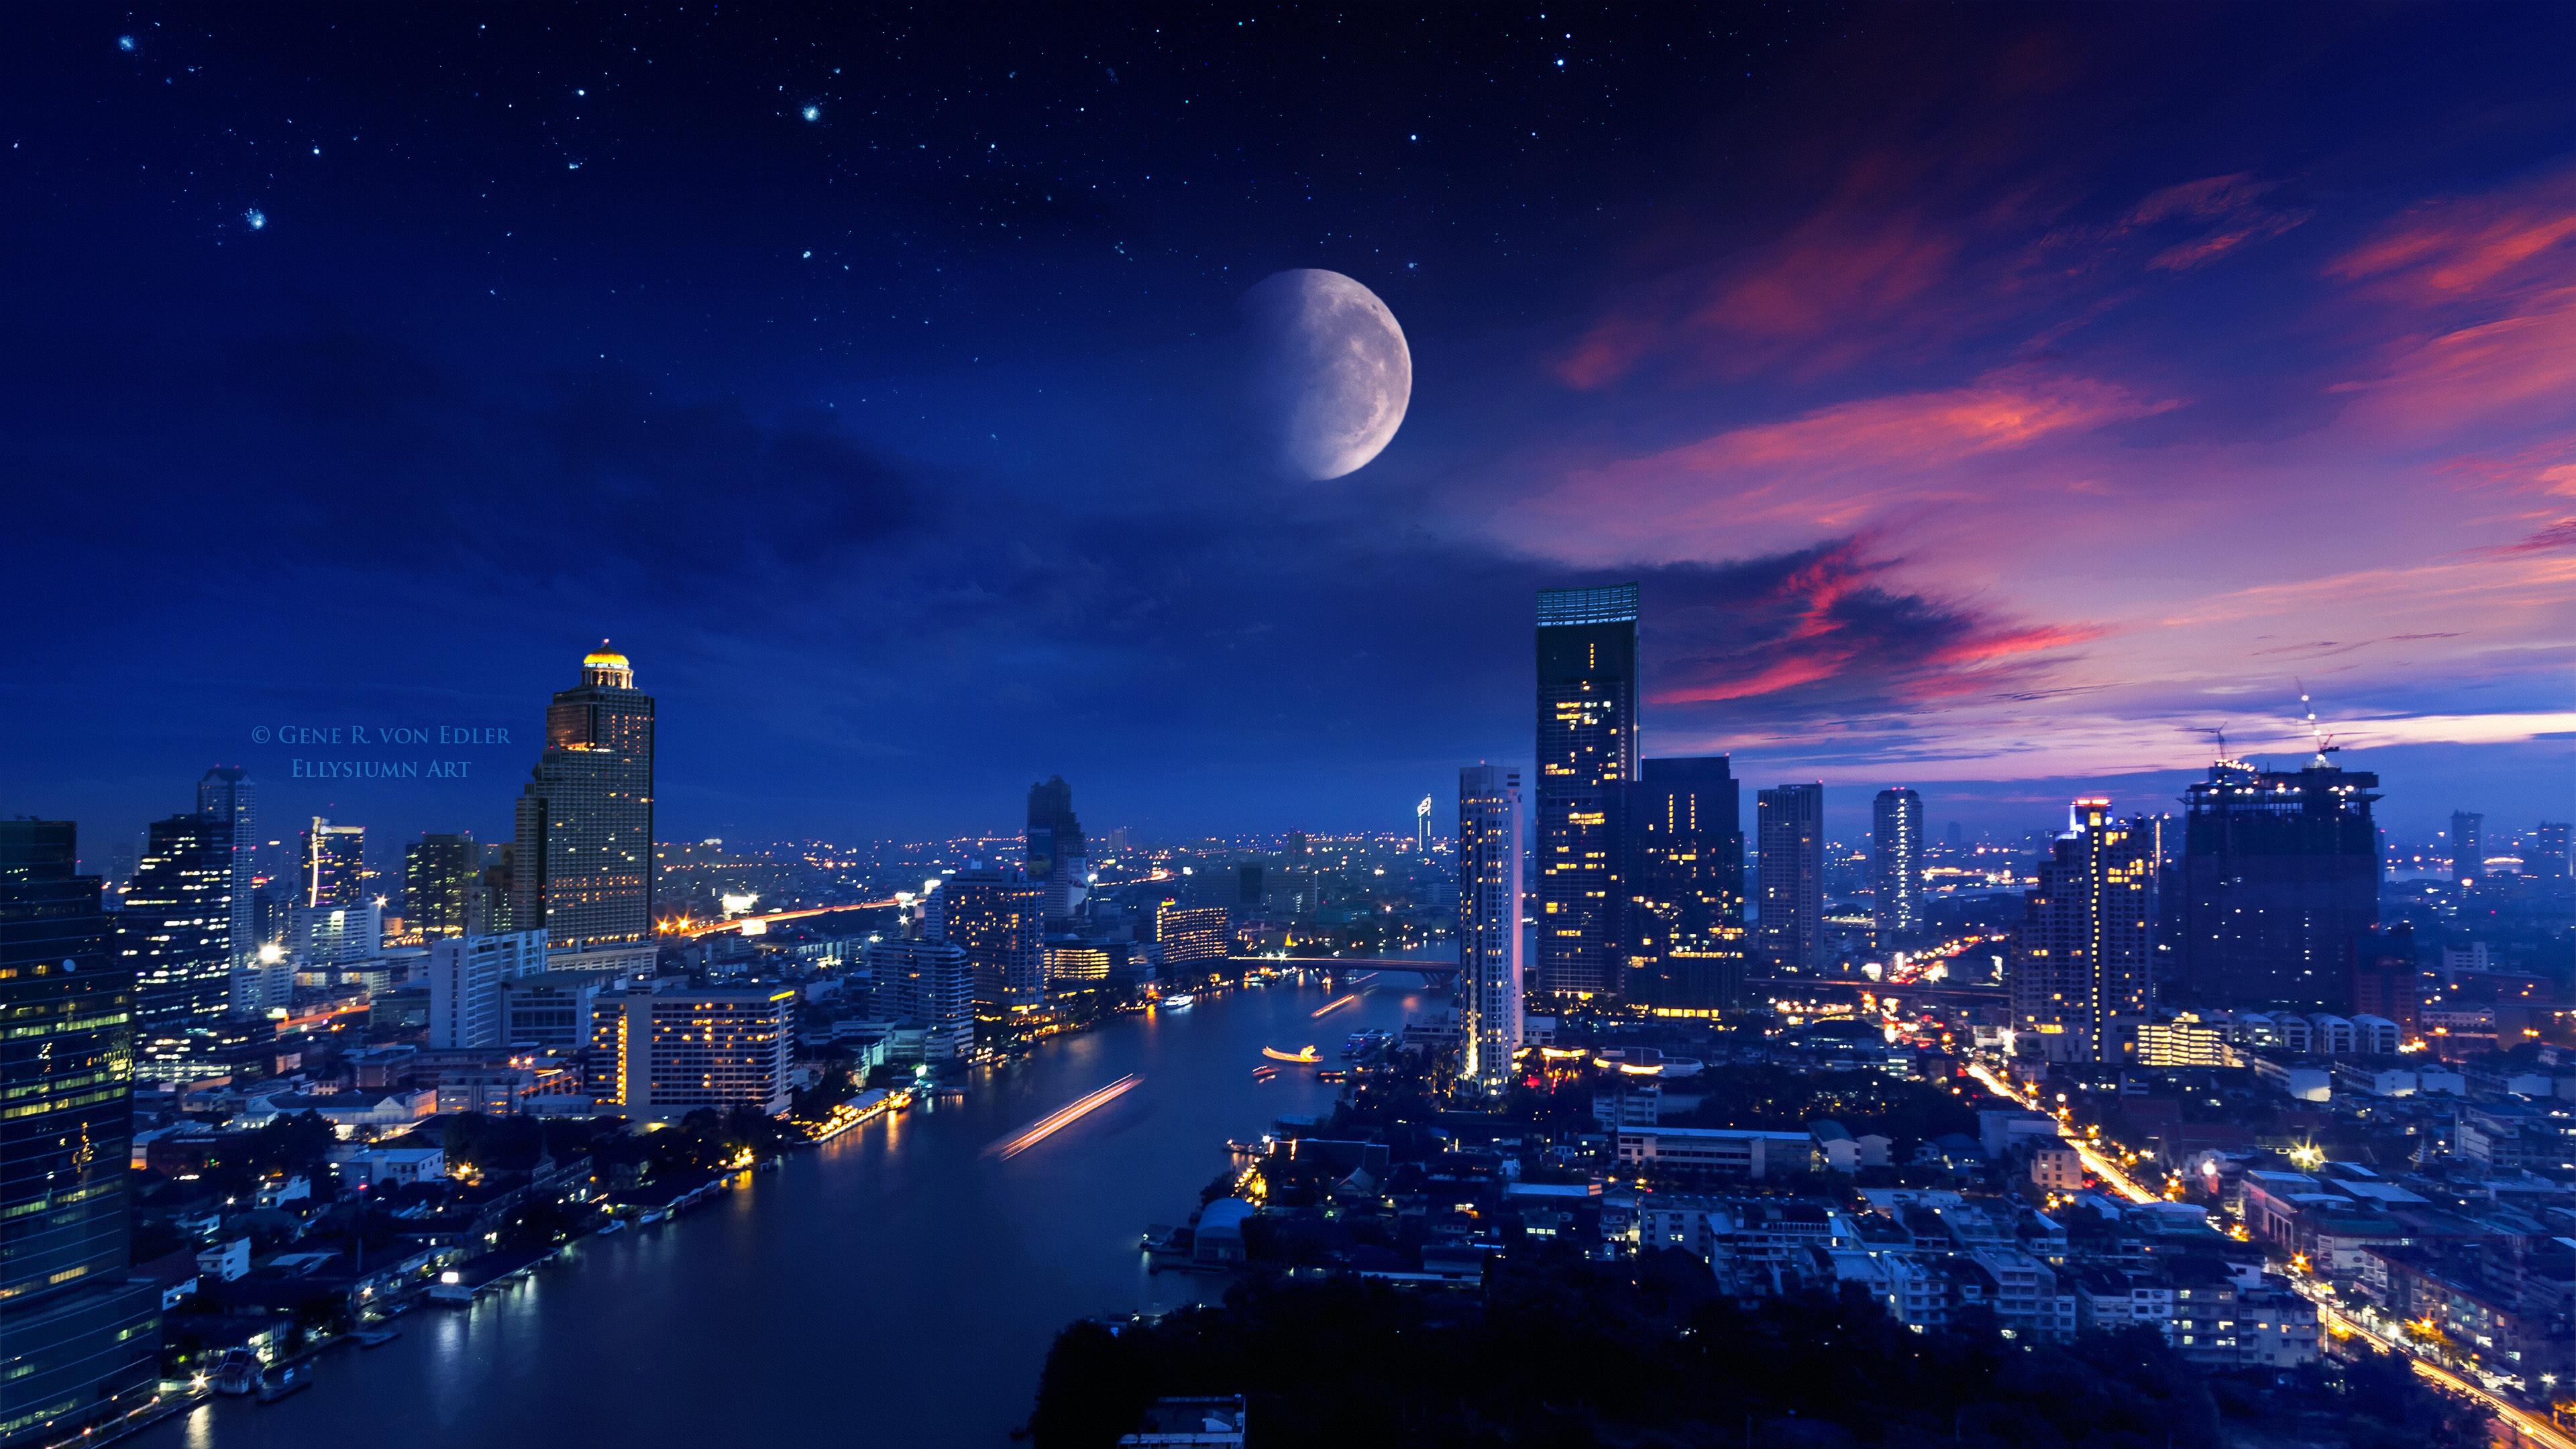 City Lights Moon Vibrant 4k, HD Photography, 4k Wallpapers ...